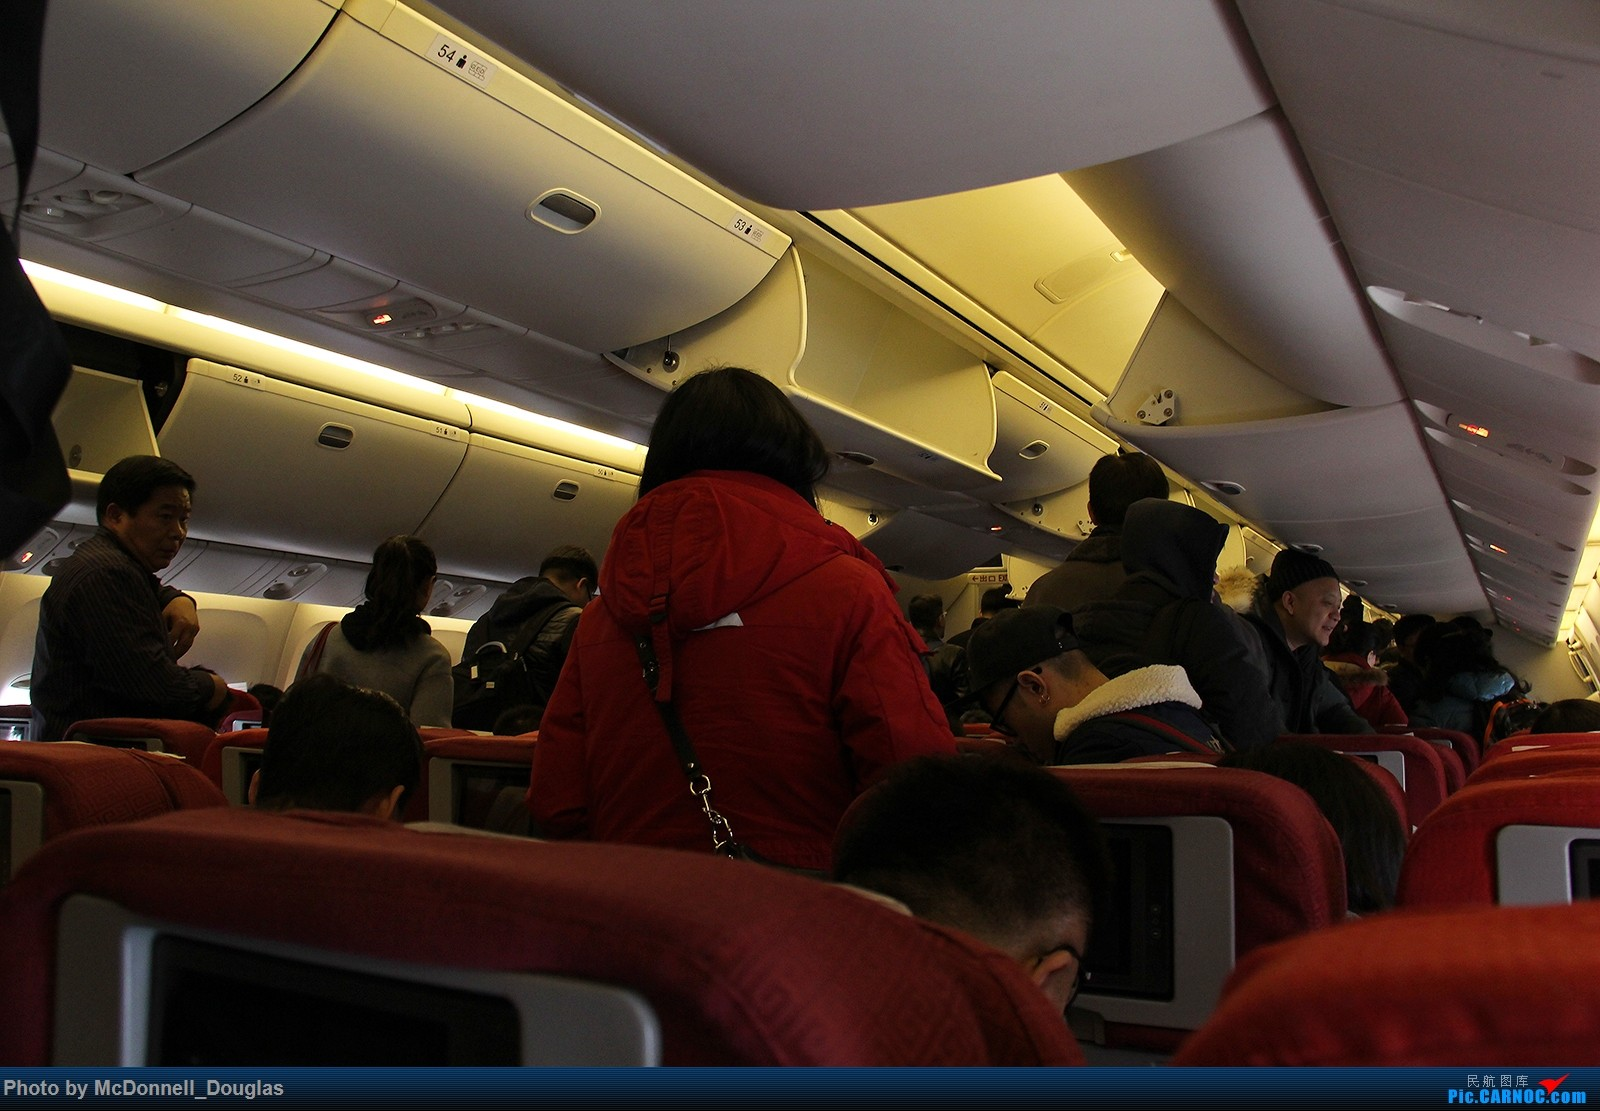 Re:[原创]【上海飞友会】【zc带你游天下(4)】不远千里飞跃喜马拉雅去看你,探寻高山另一边的神秘国度,和一群贫穷却快乐着的人们 BOEING 767-34P/ER B-2492 中国成都双流国际机场